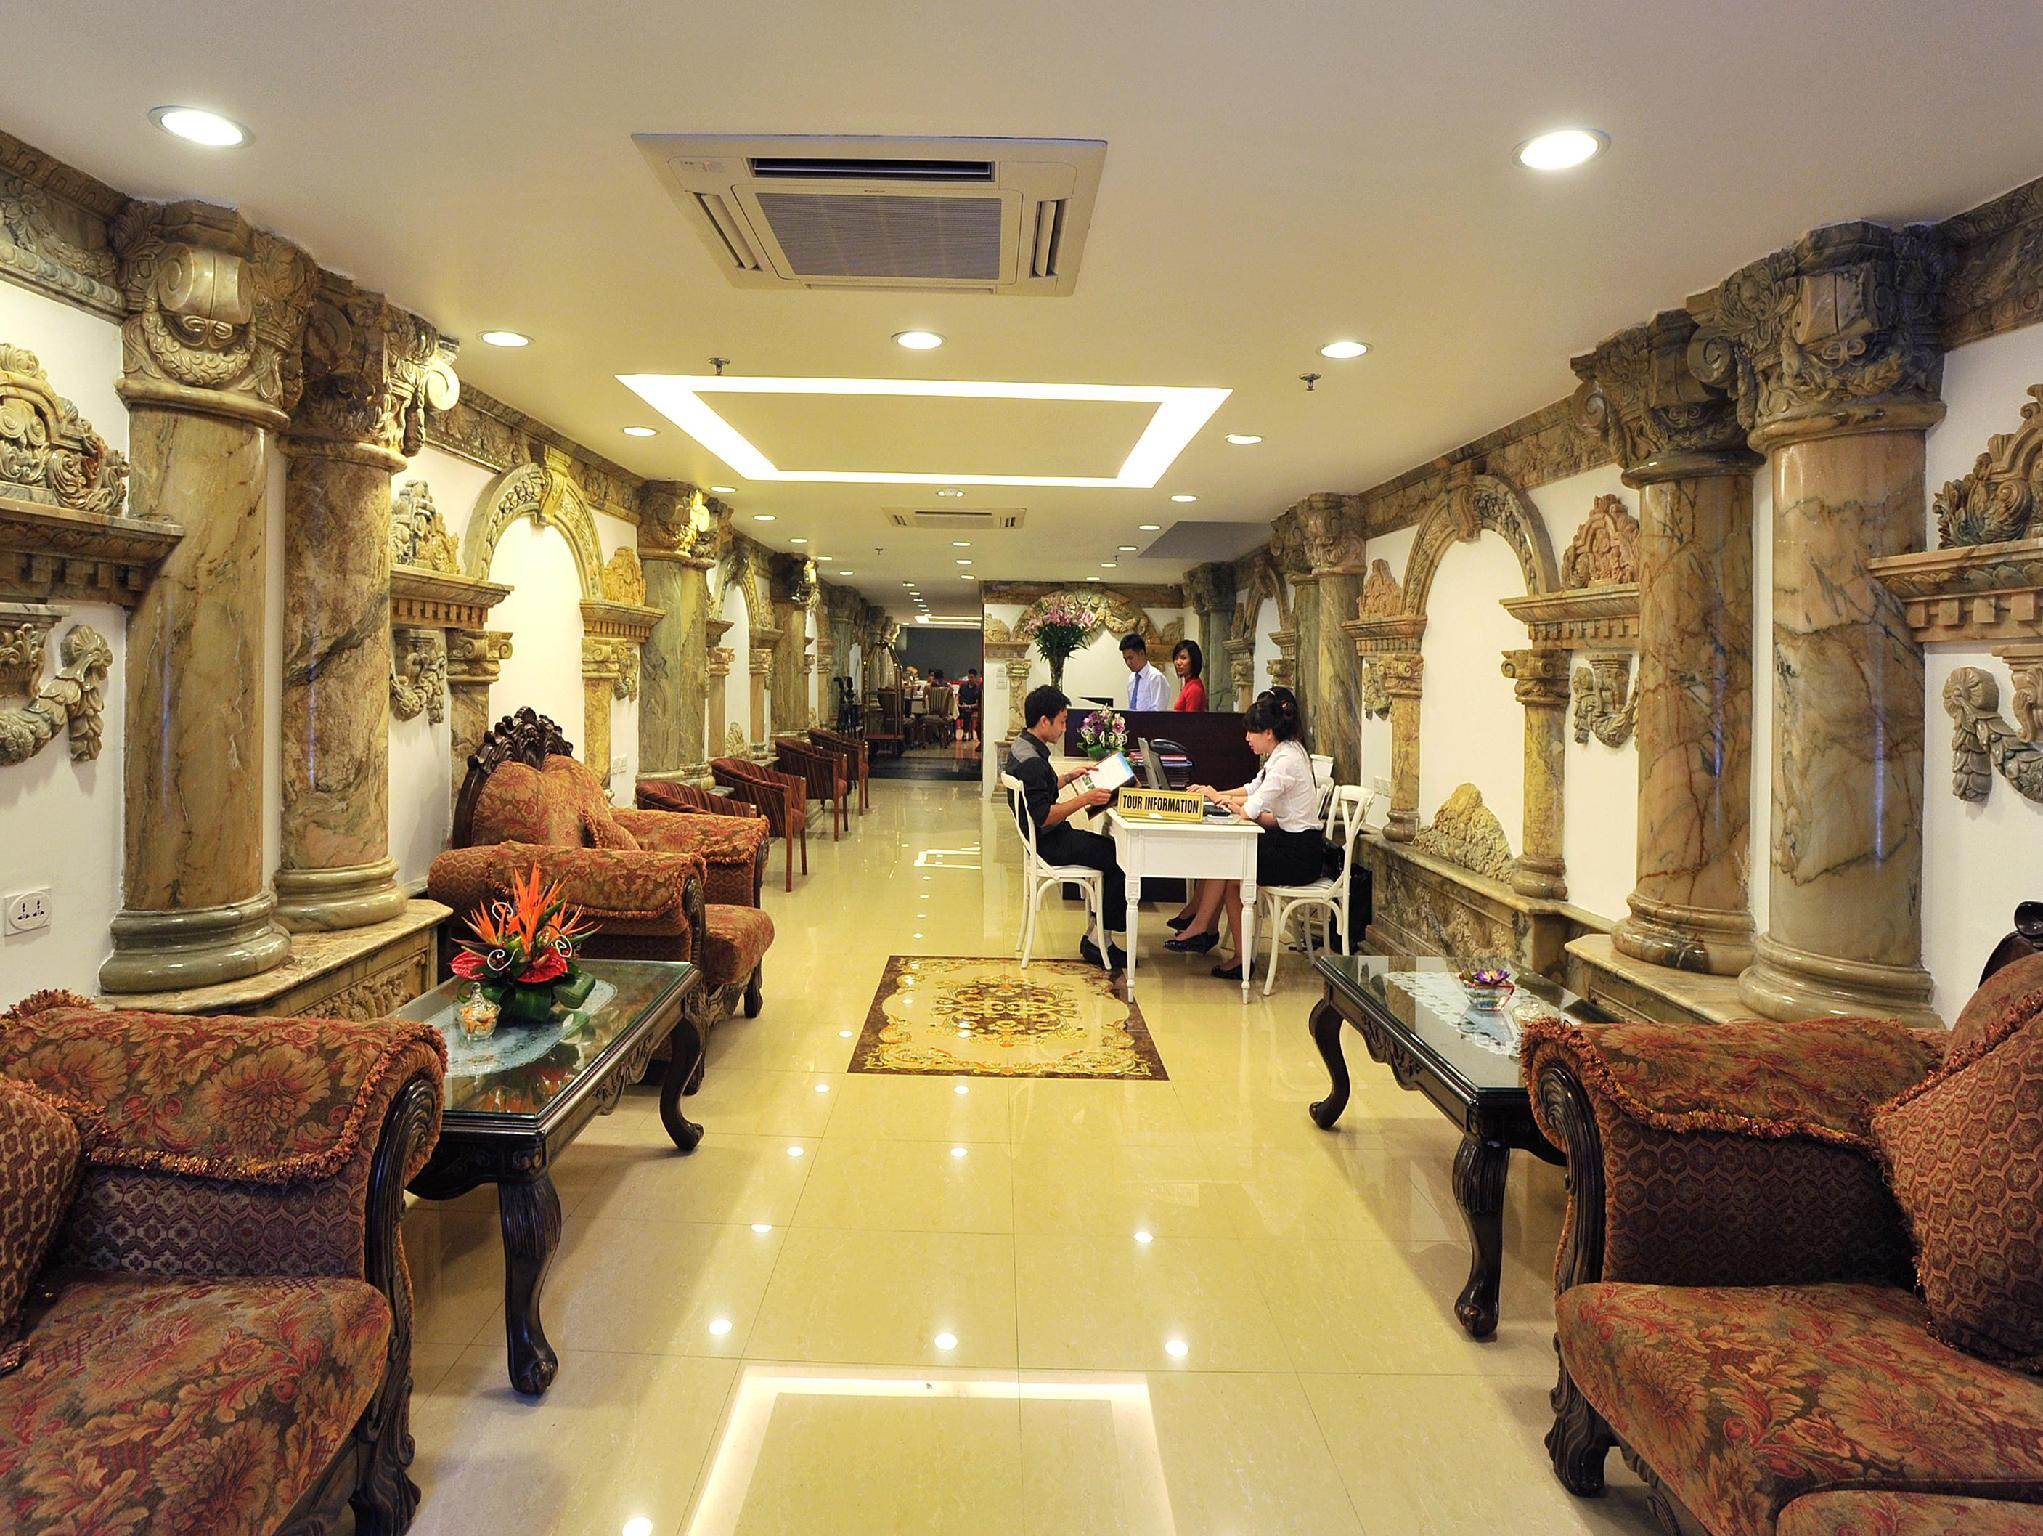 Hanoi Legacy Hotel - Hang Bac - Hotell och Boende i Vietnam , Hanoi